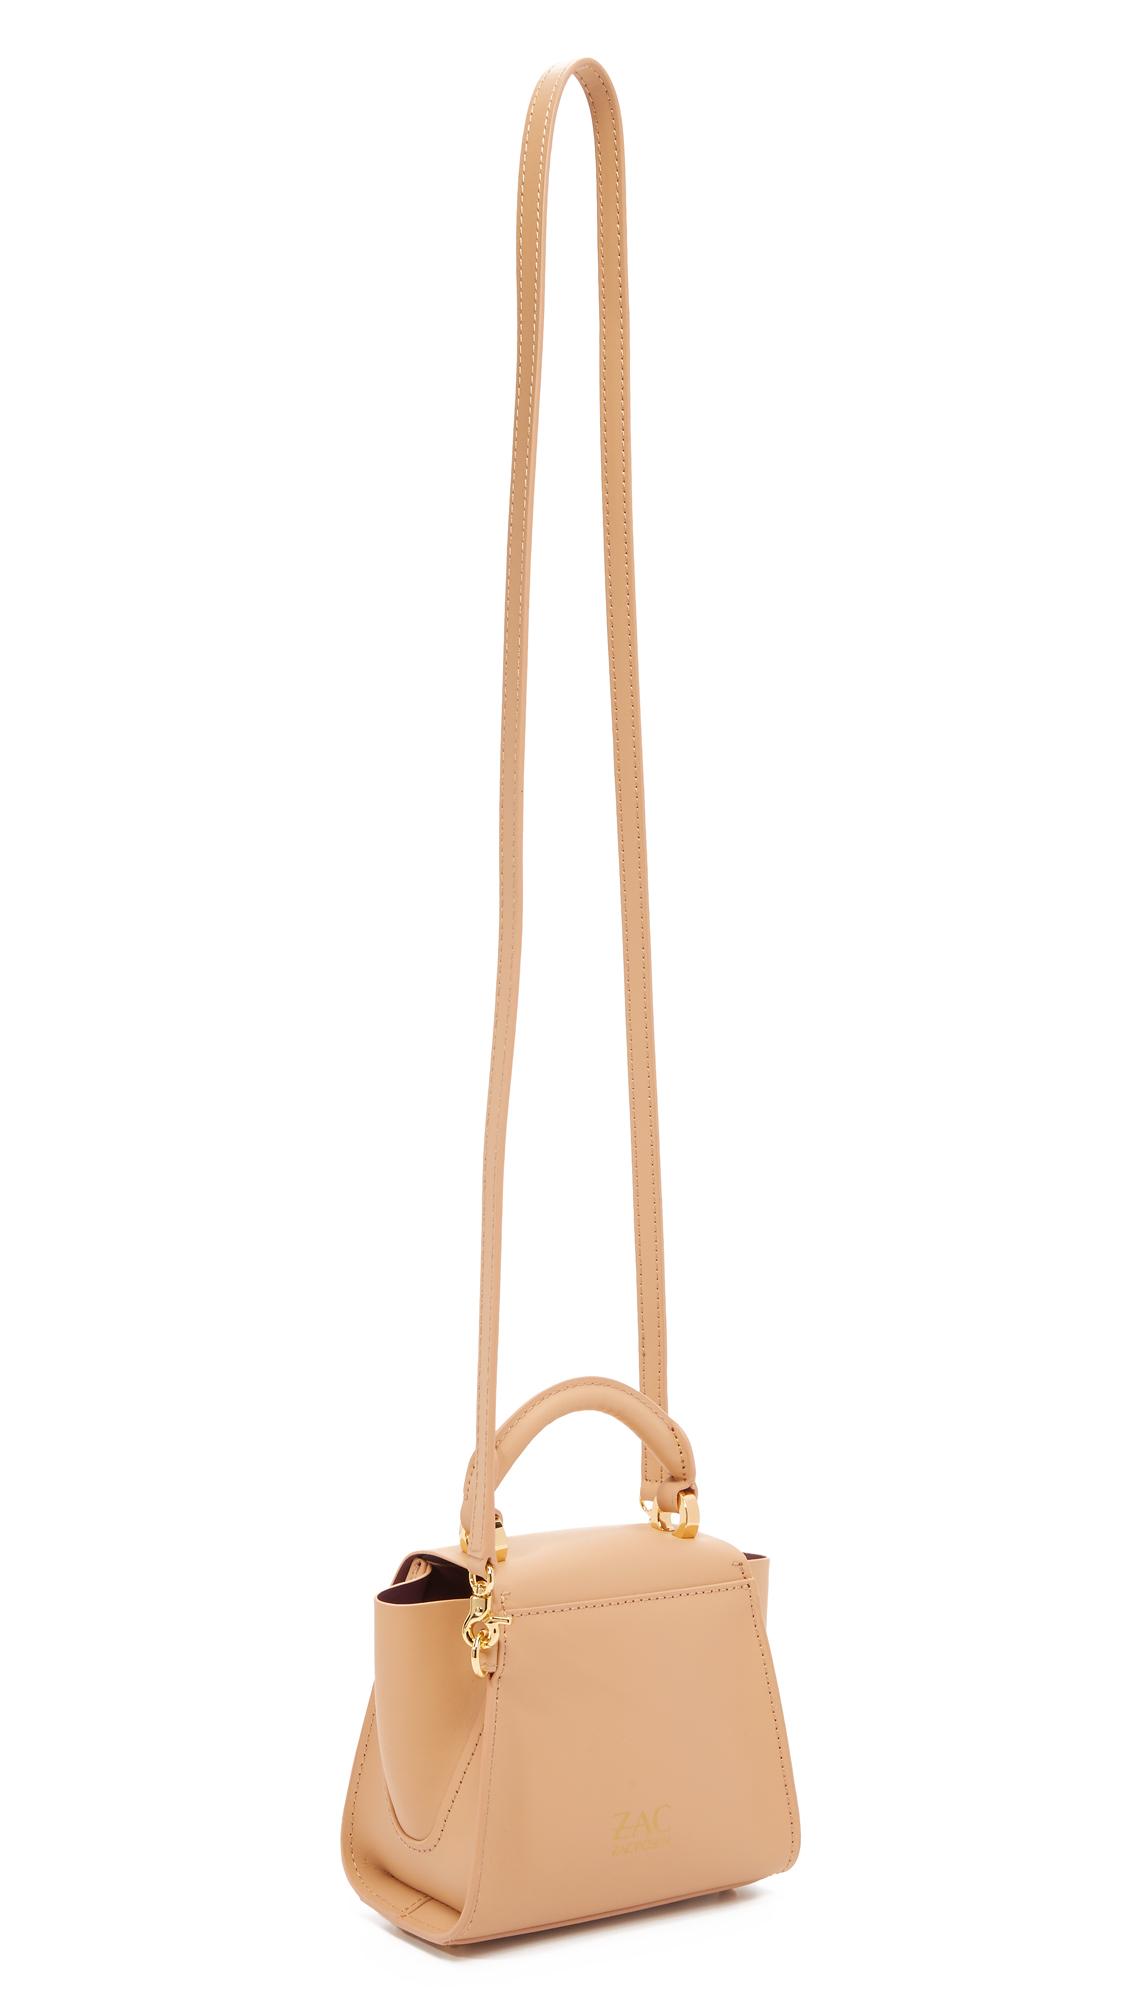 Zac Zac Posen Leather Eartha Top Handle Mini Cross Body Bag in Orange